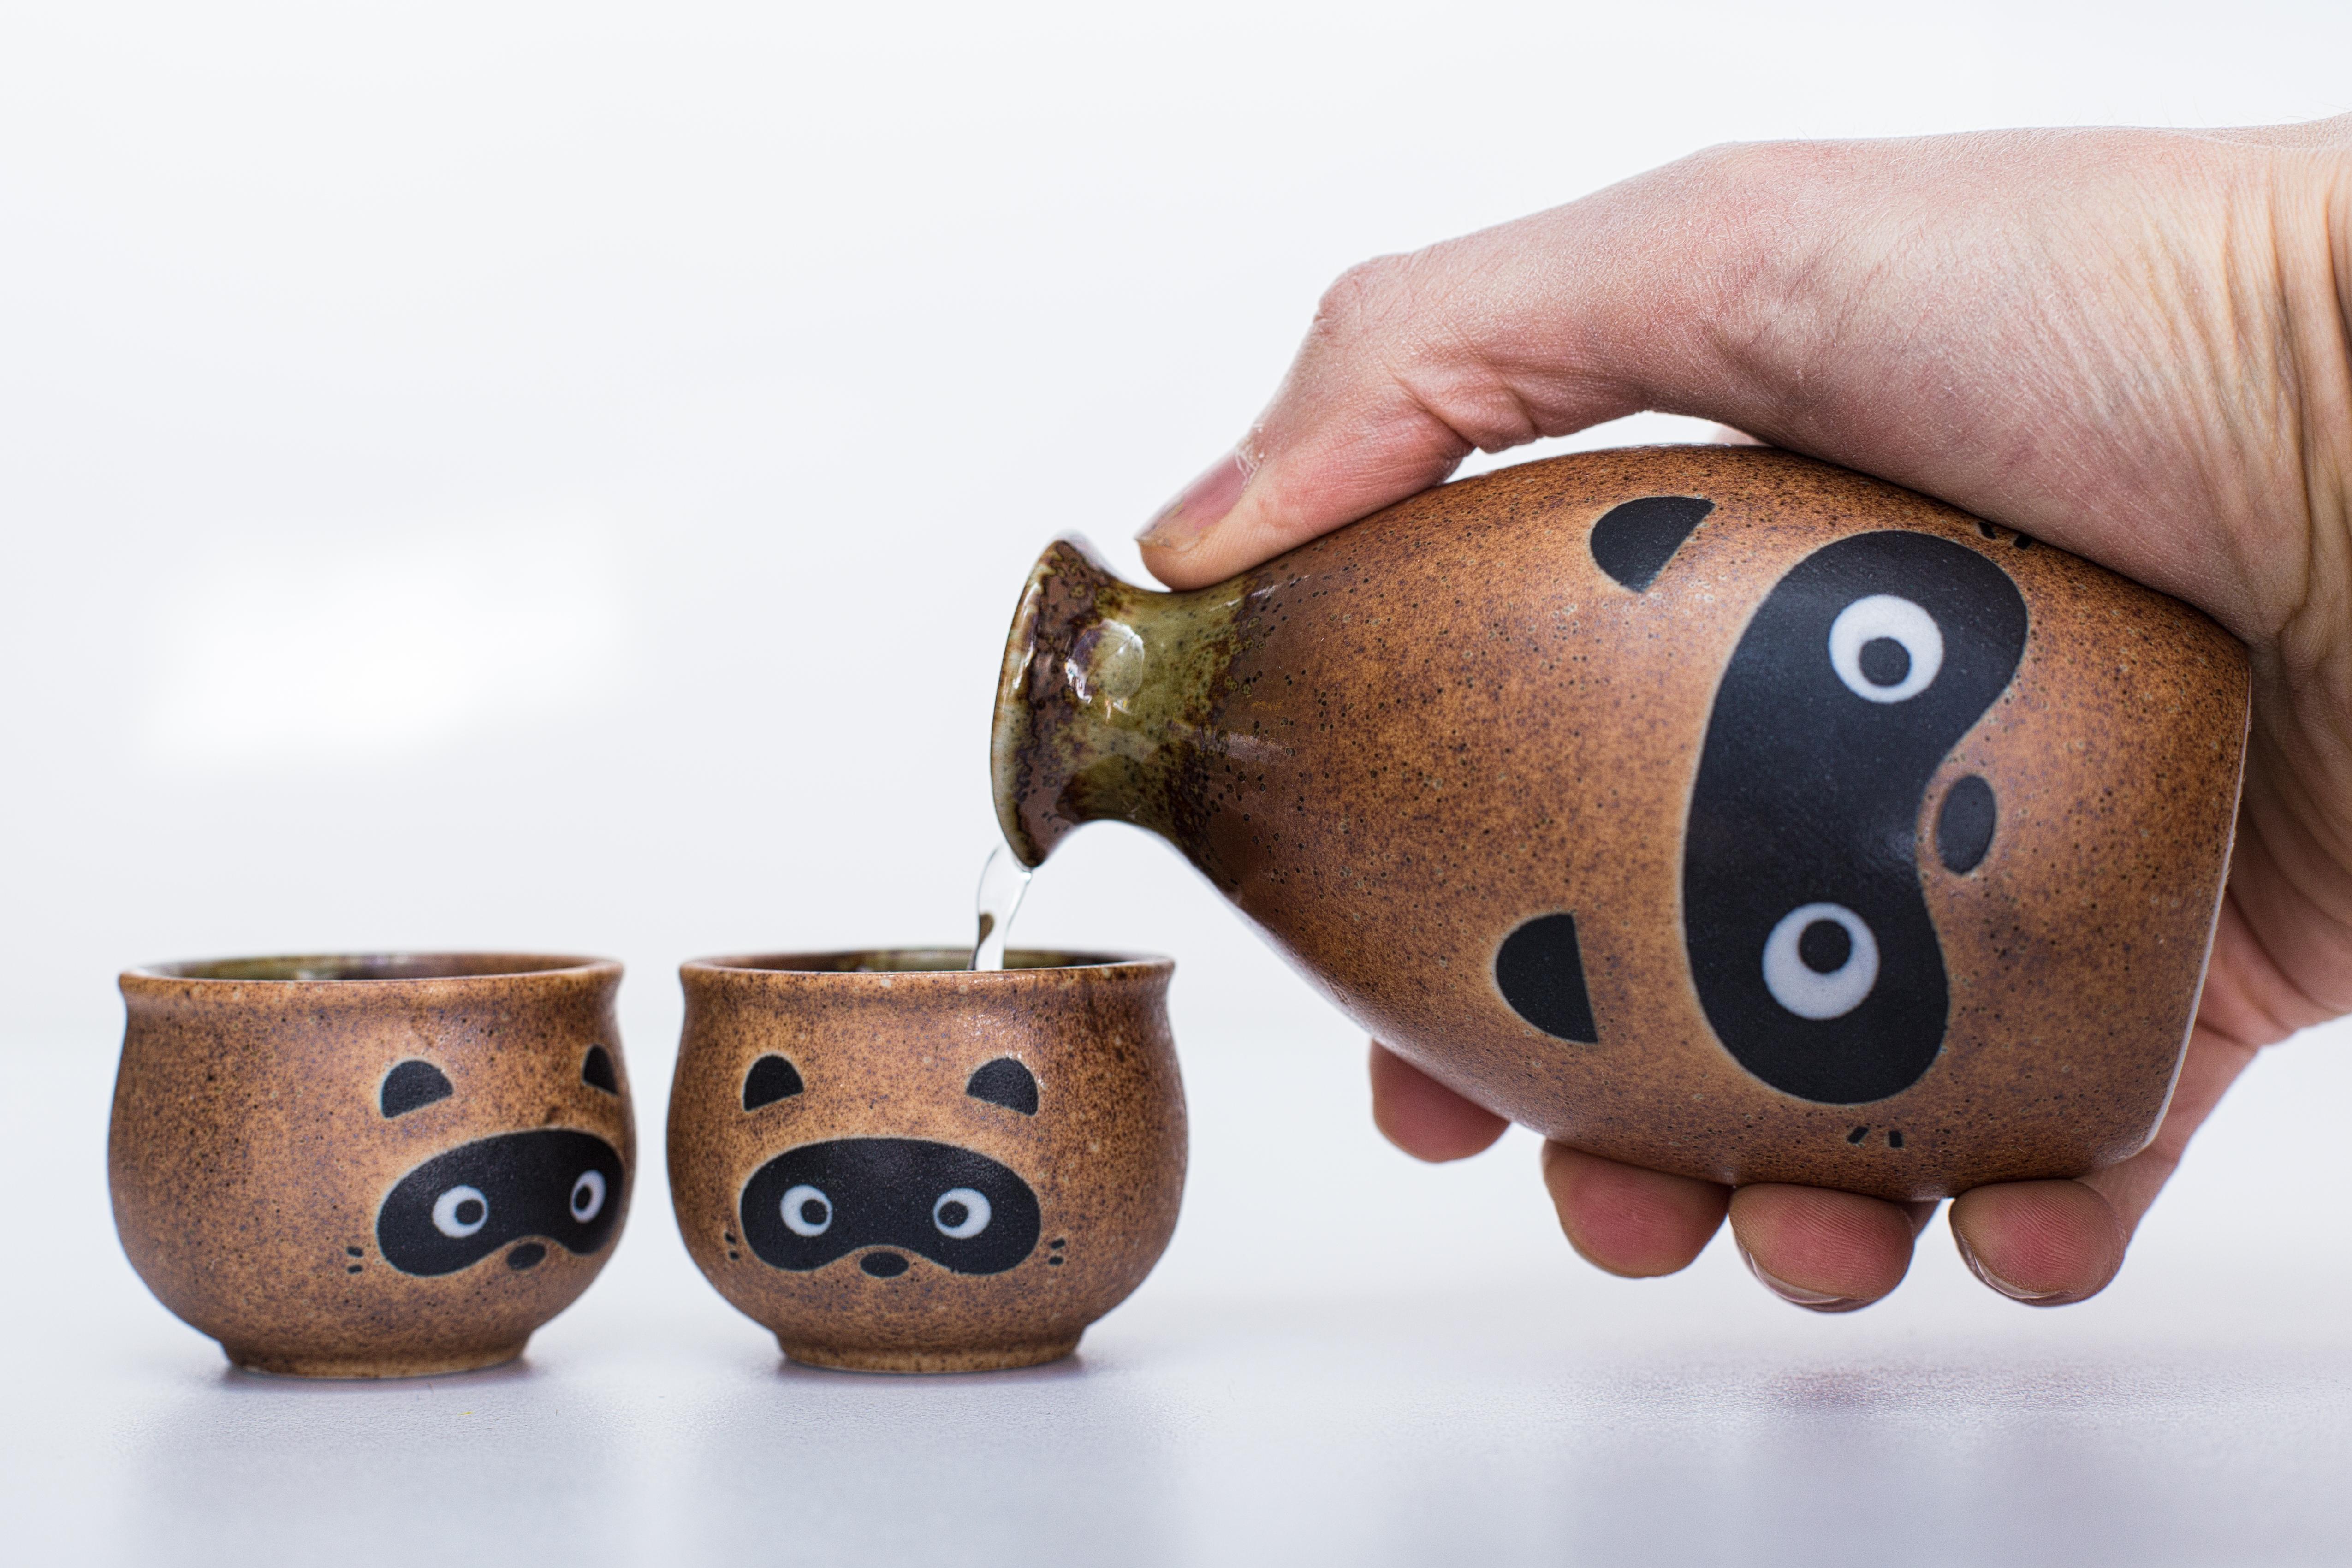 тапети питие халби чаша миещи мечки саке керамика